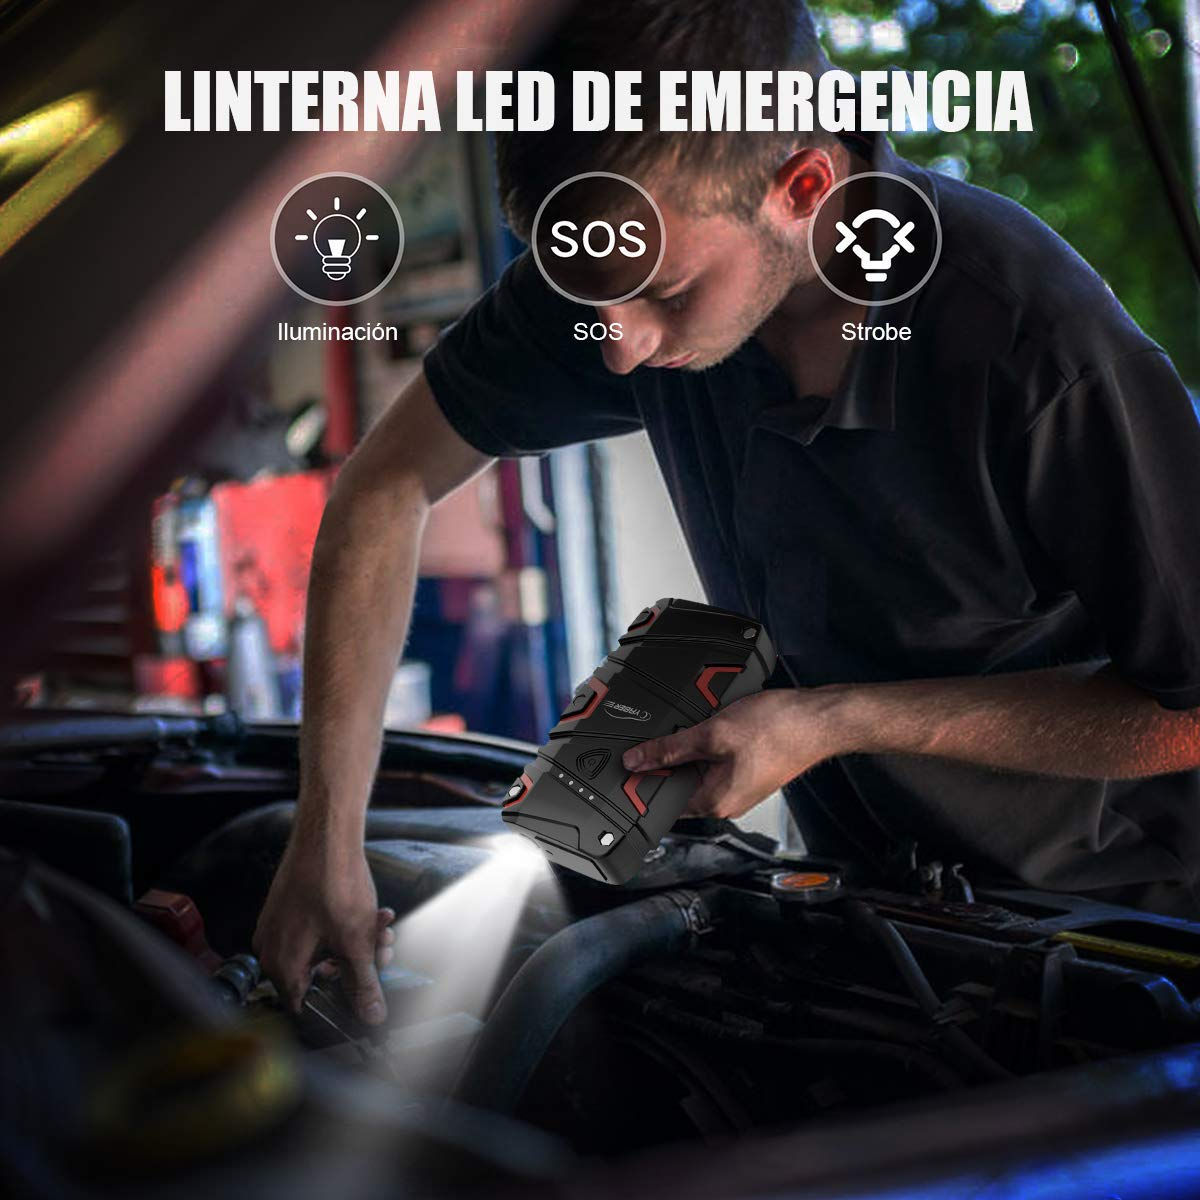 con IP68 Impermeable 1200A Arrancador Bater/ía Coche Jump Starter con Carga R/ápida QC3.0 para 7.5L de Gasolina o 6.0L de Diesel YABER Arrancador de Coches